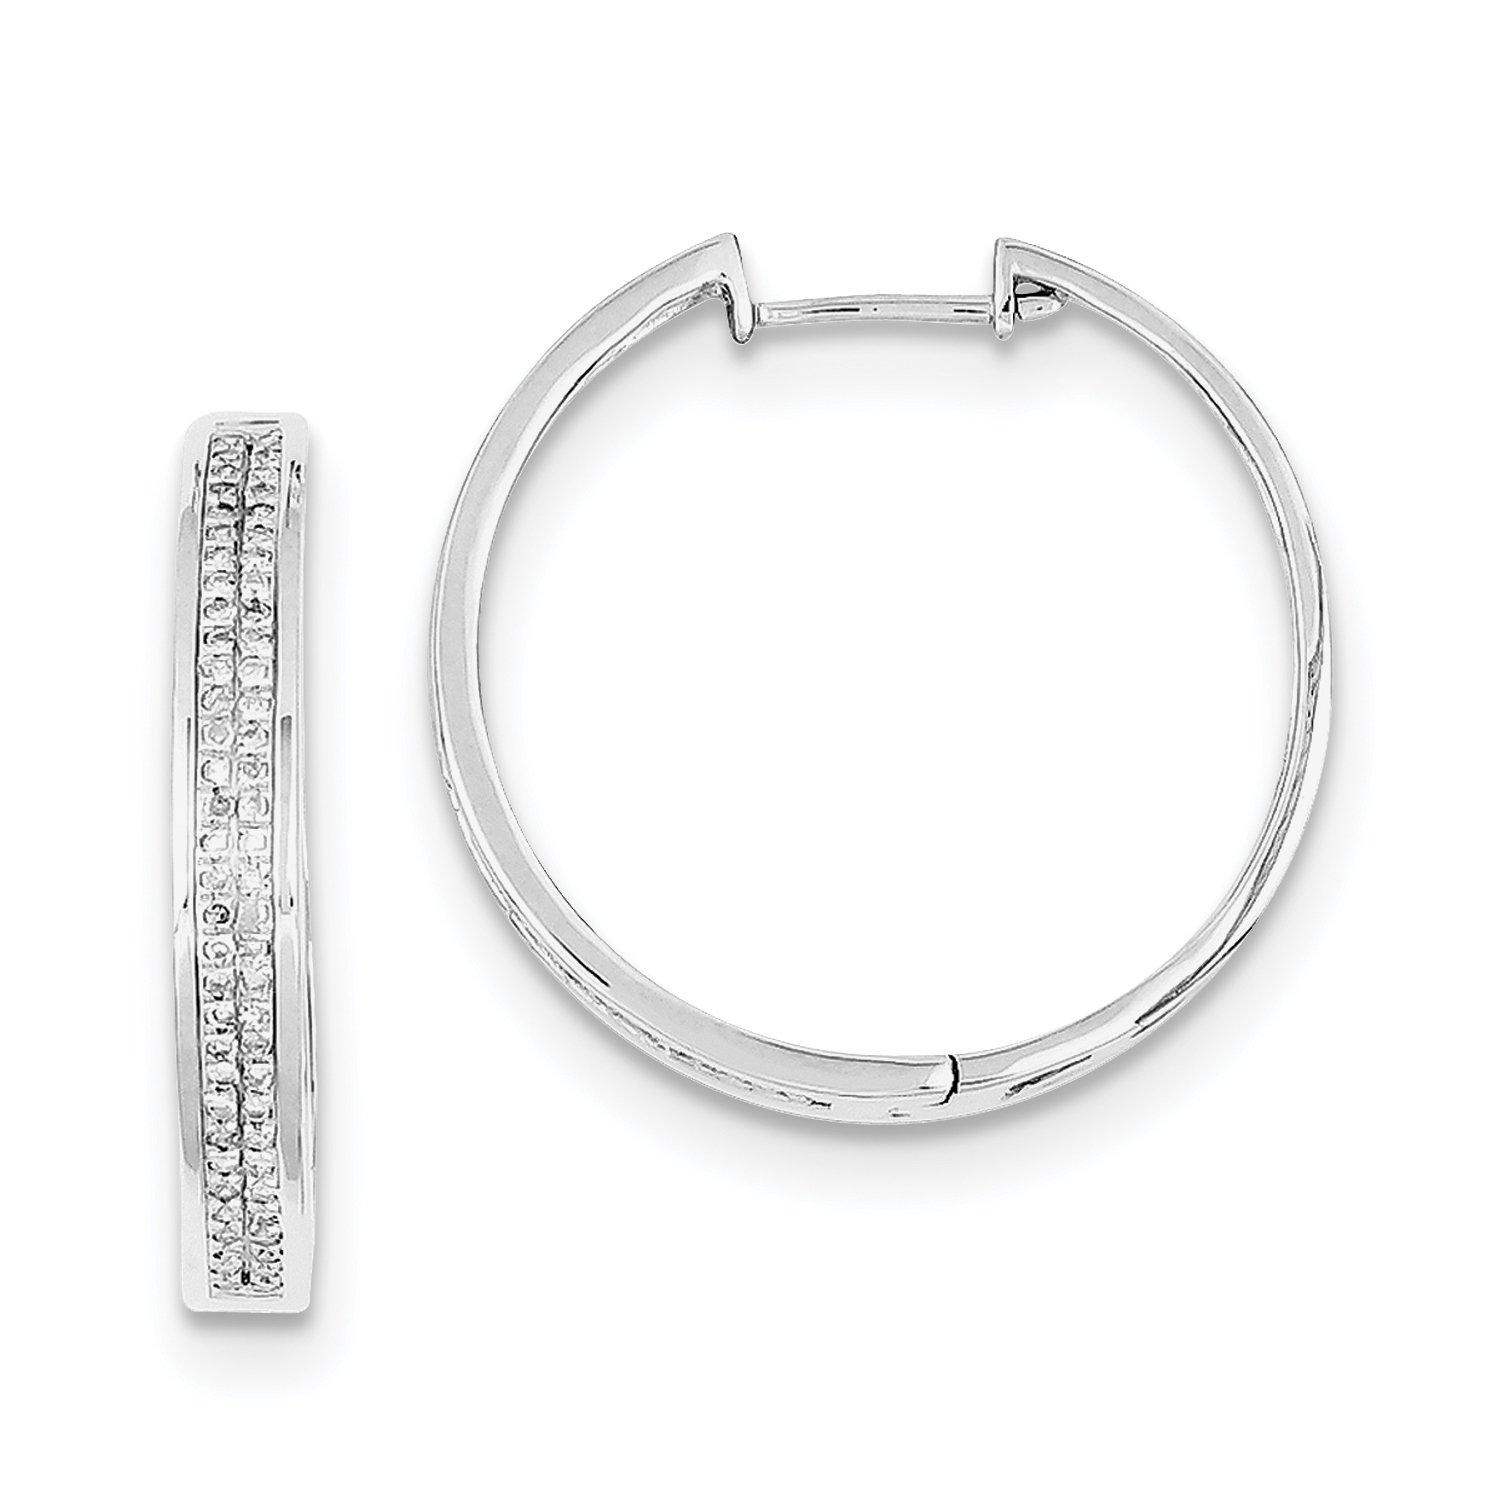 ICE CARATS 925 Sterling Silver Diamond Round Hinged Hoop Earrings Ear Hoops Set Fine Jewelry Gift Set For Women Heart